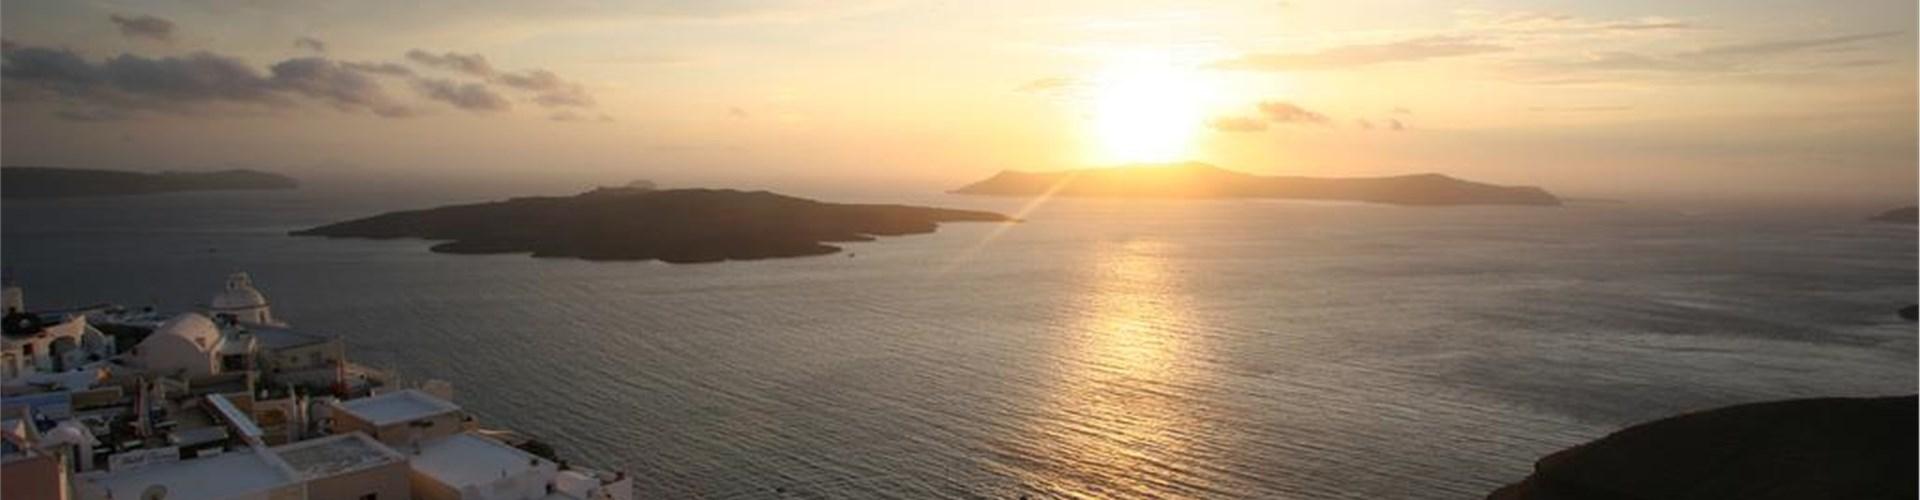 Santorini low-budget - Is it possible?